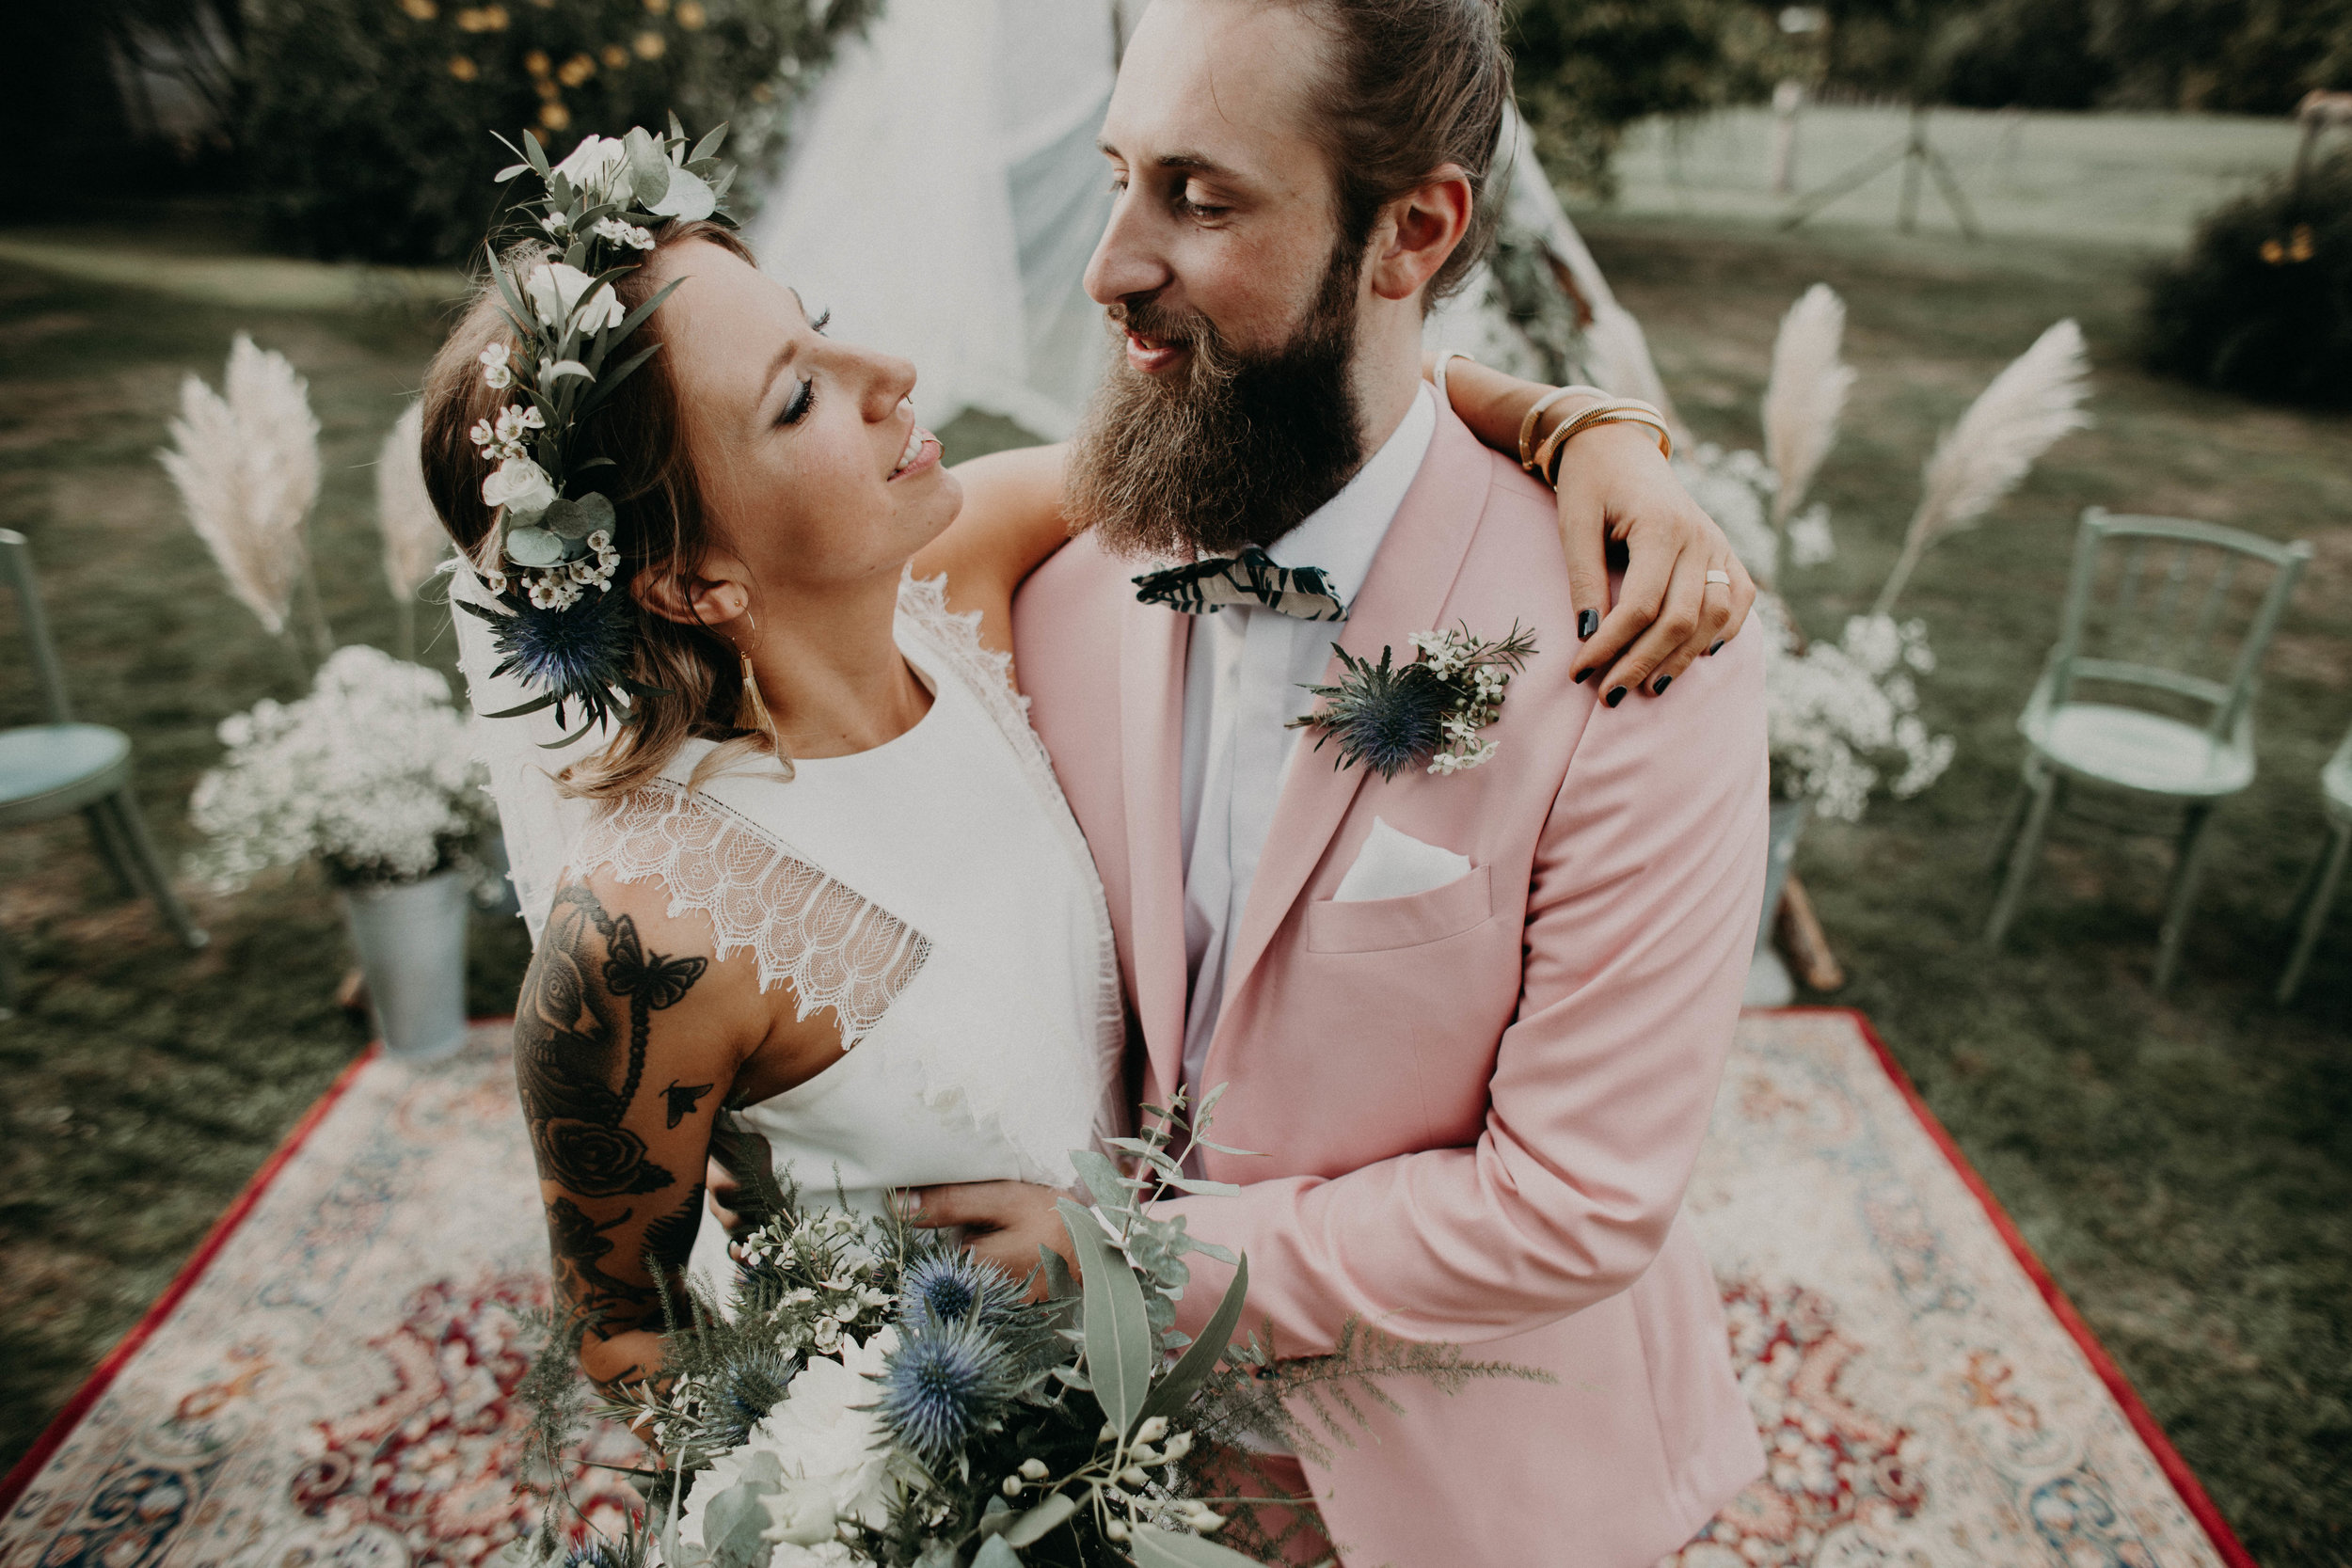 Le mariage de Marieke et Greg -